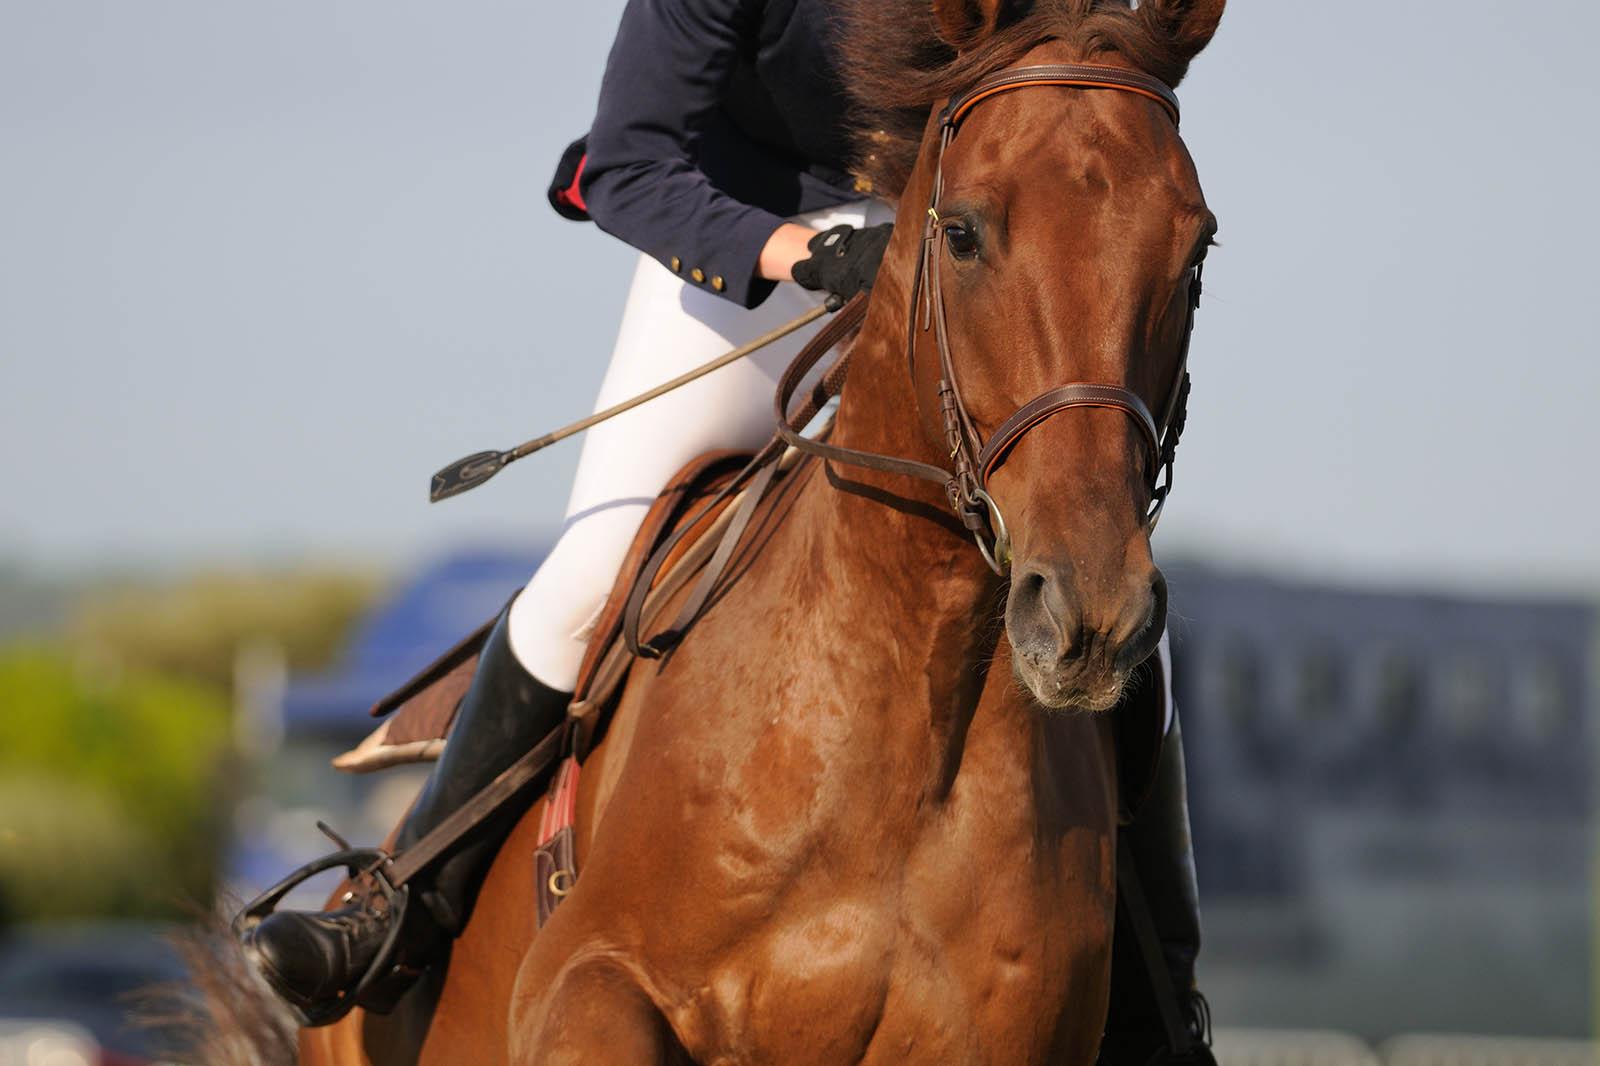 Olympia 2020: Tierquälerei im olympischen Reitsport